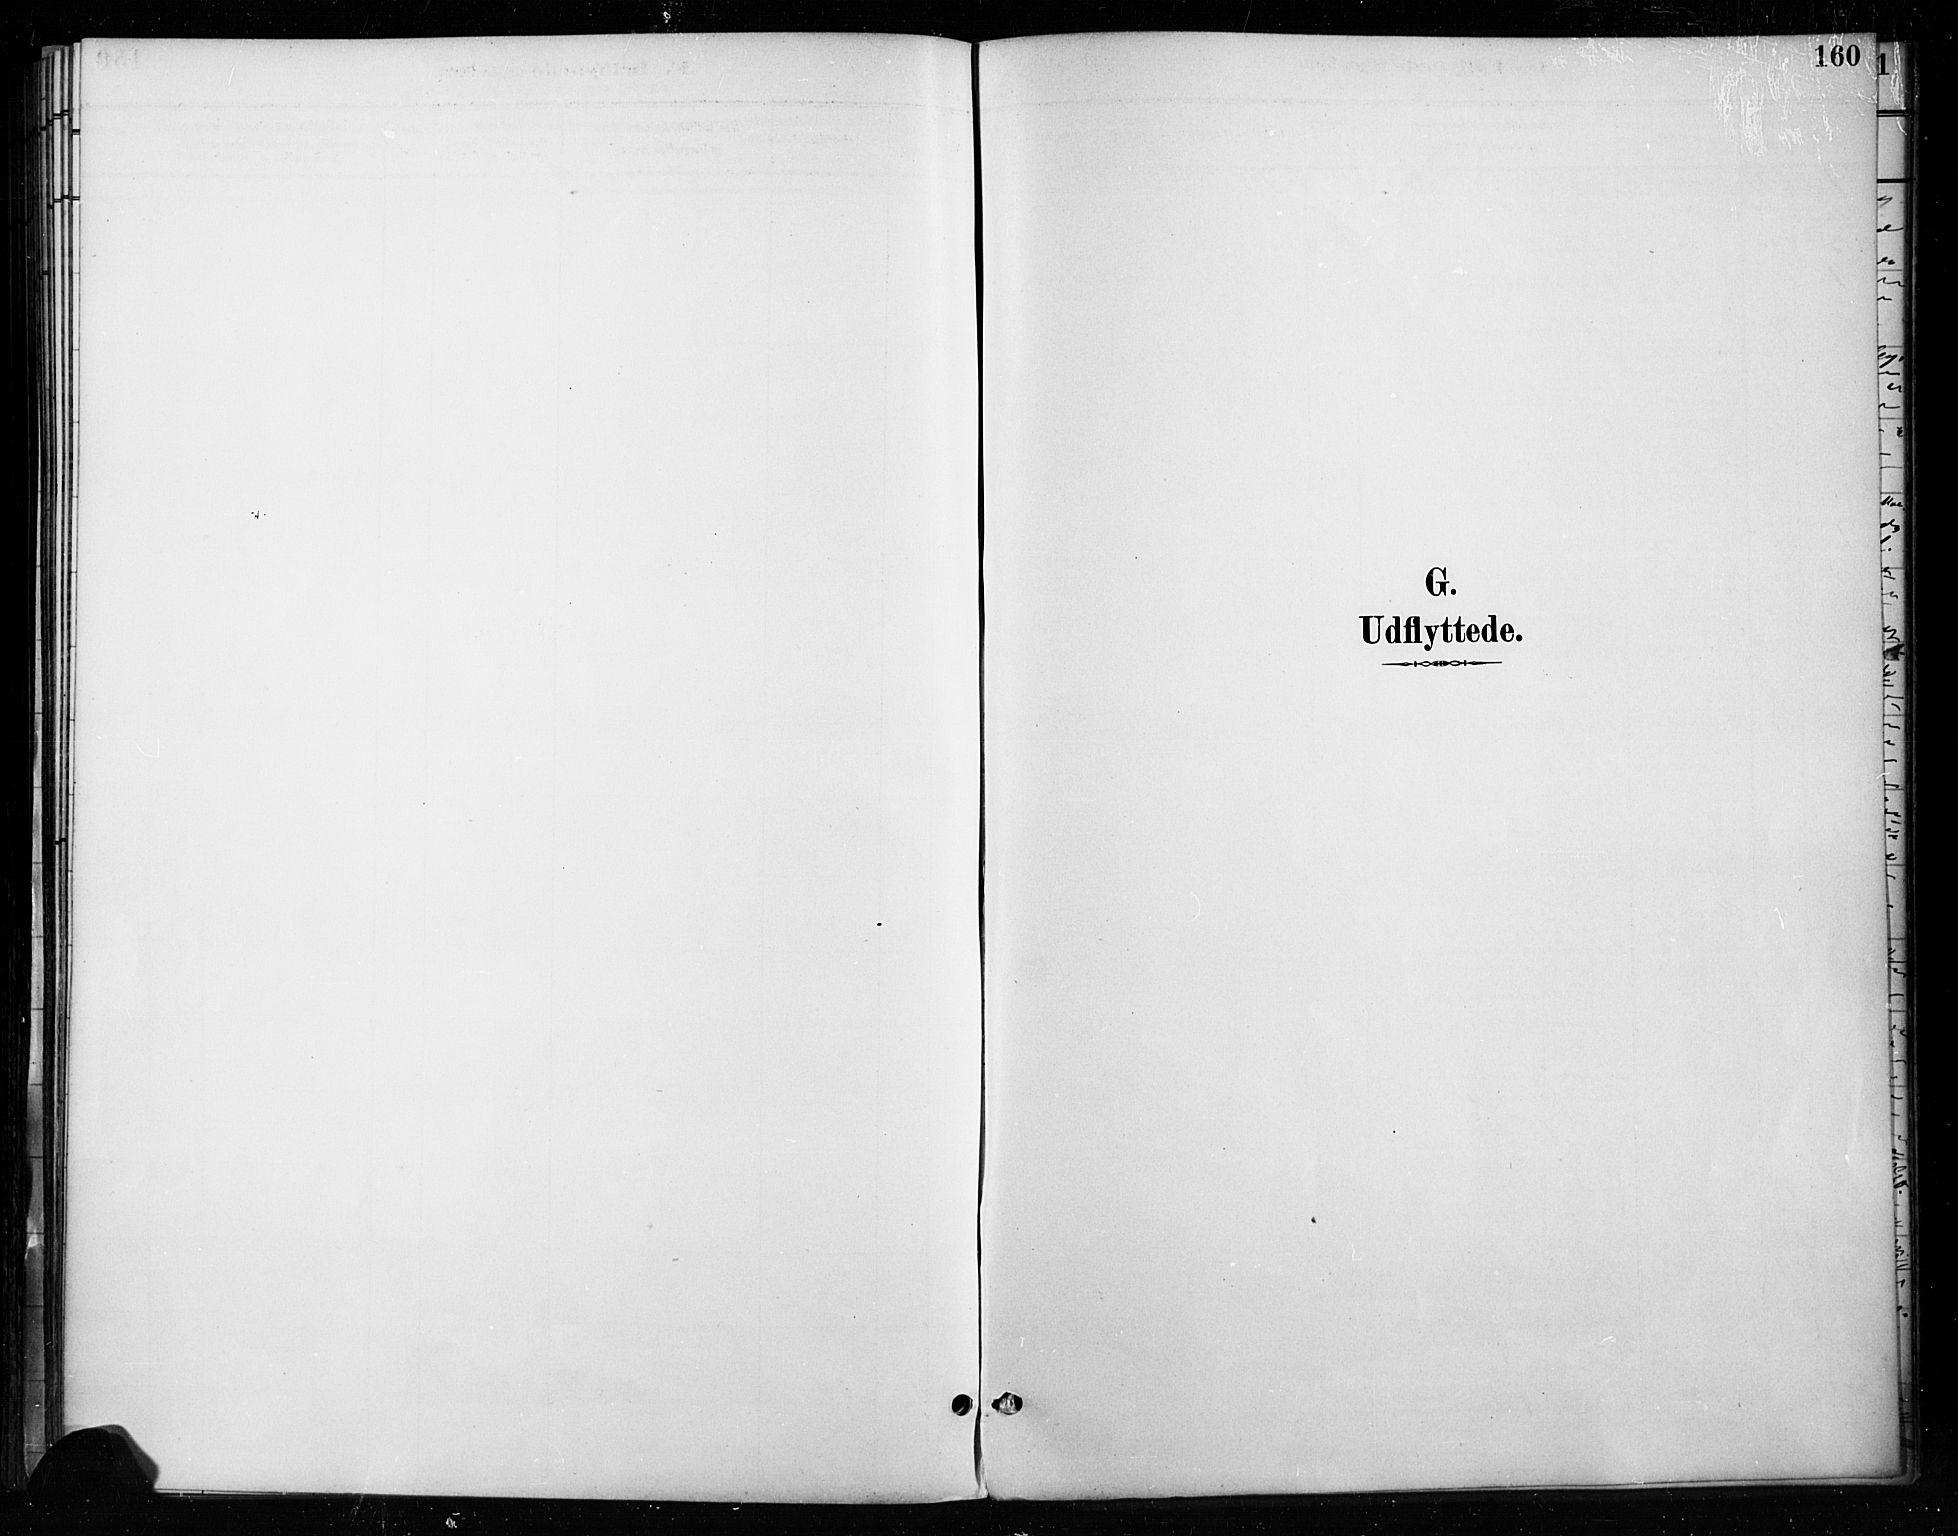 SAH, Gran prestekontor, Ministerialbok nr. 18, 1889-1899, s. 160